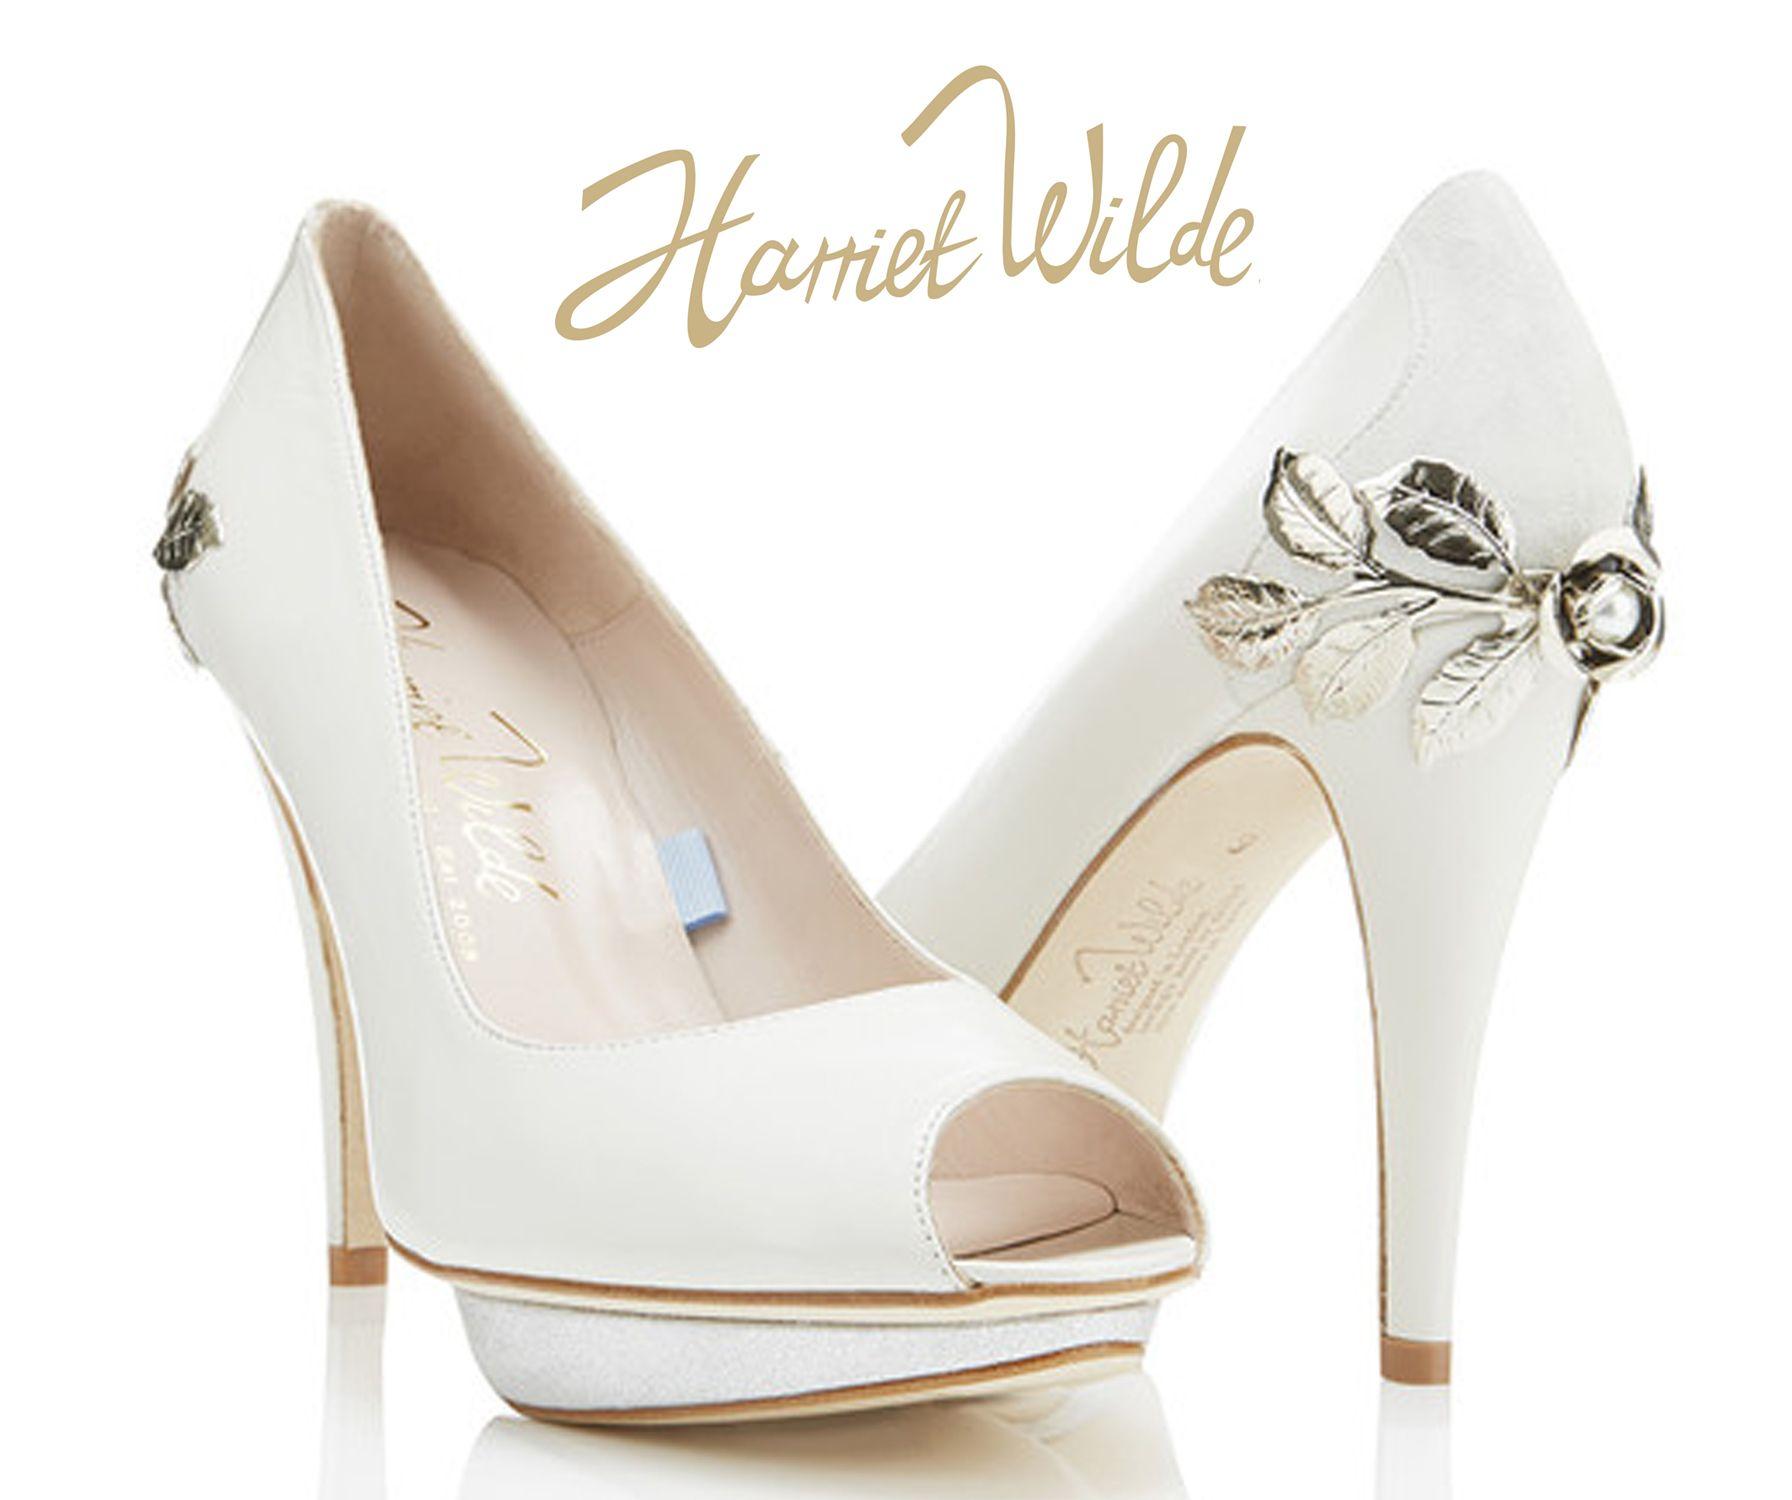 Bridgette Bespoke Harriet Wilde Wedding Shoes Price On Request Visit Www Harrietwilde